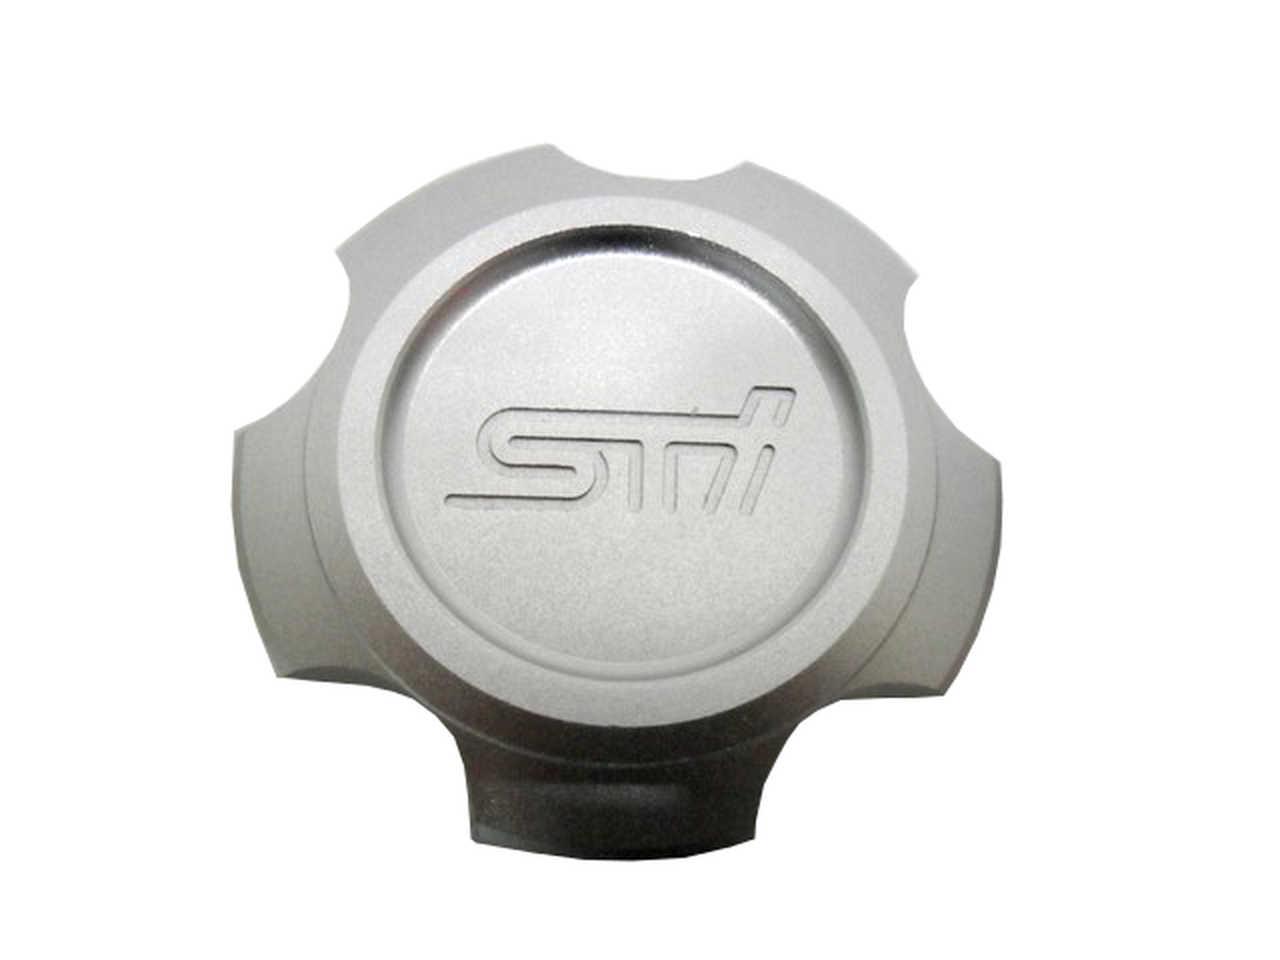 Racing Black Aluminum Engine Oil Cap Oil Fuel Filler Tank Cover Cap For Subaru